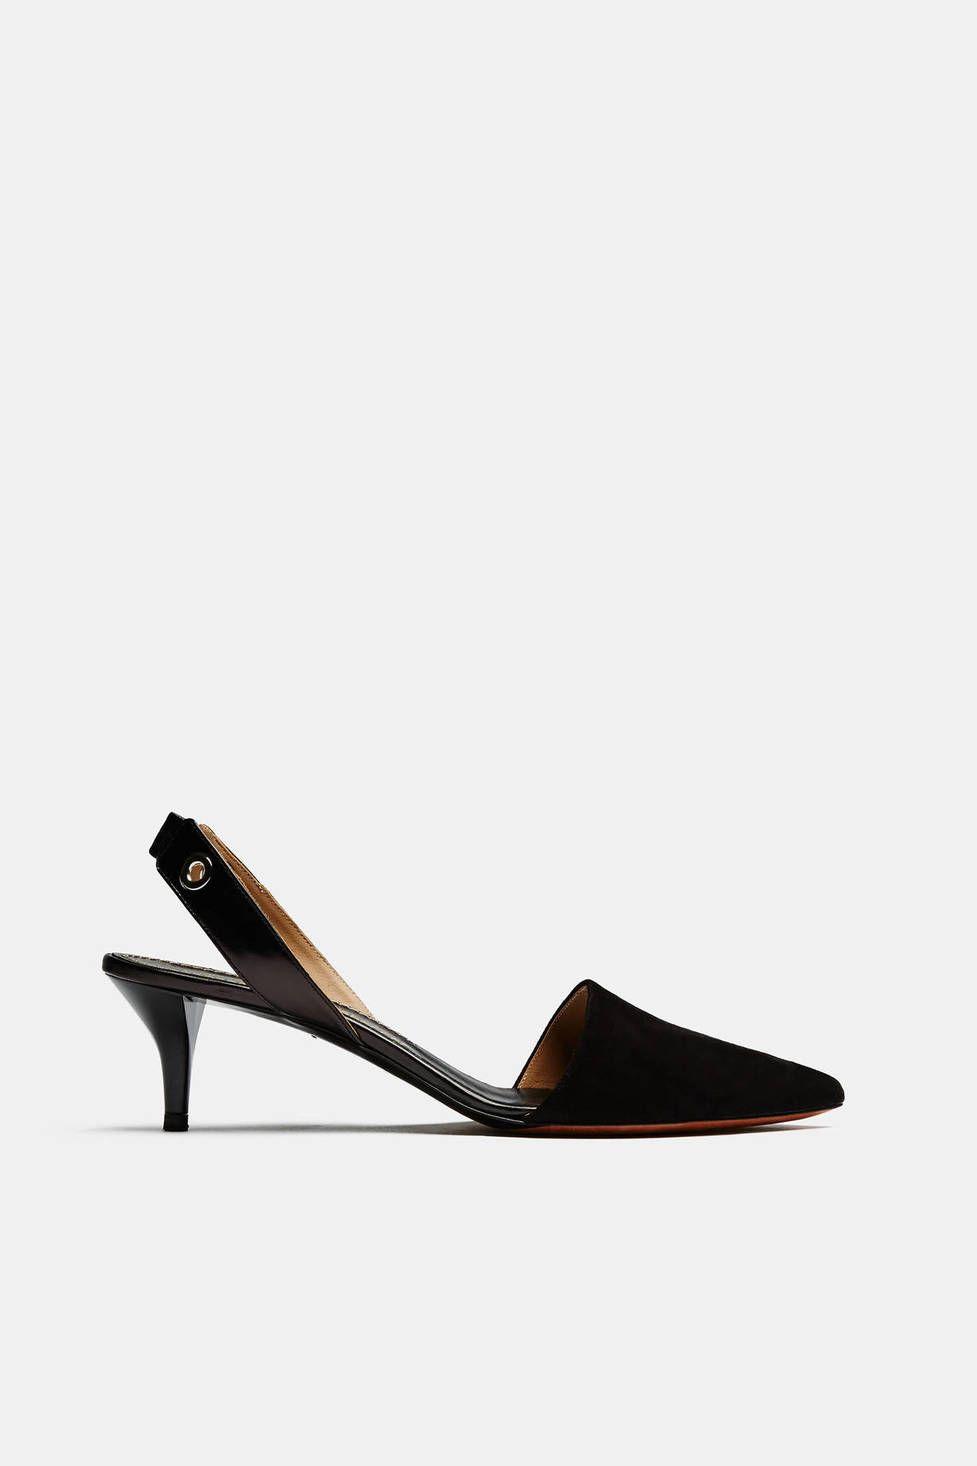 Suede Sling Back Kitten Heel Black Heels Kitten Heel Shoes Kitten Heels